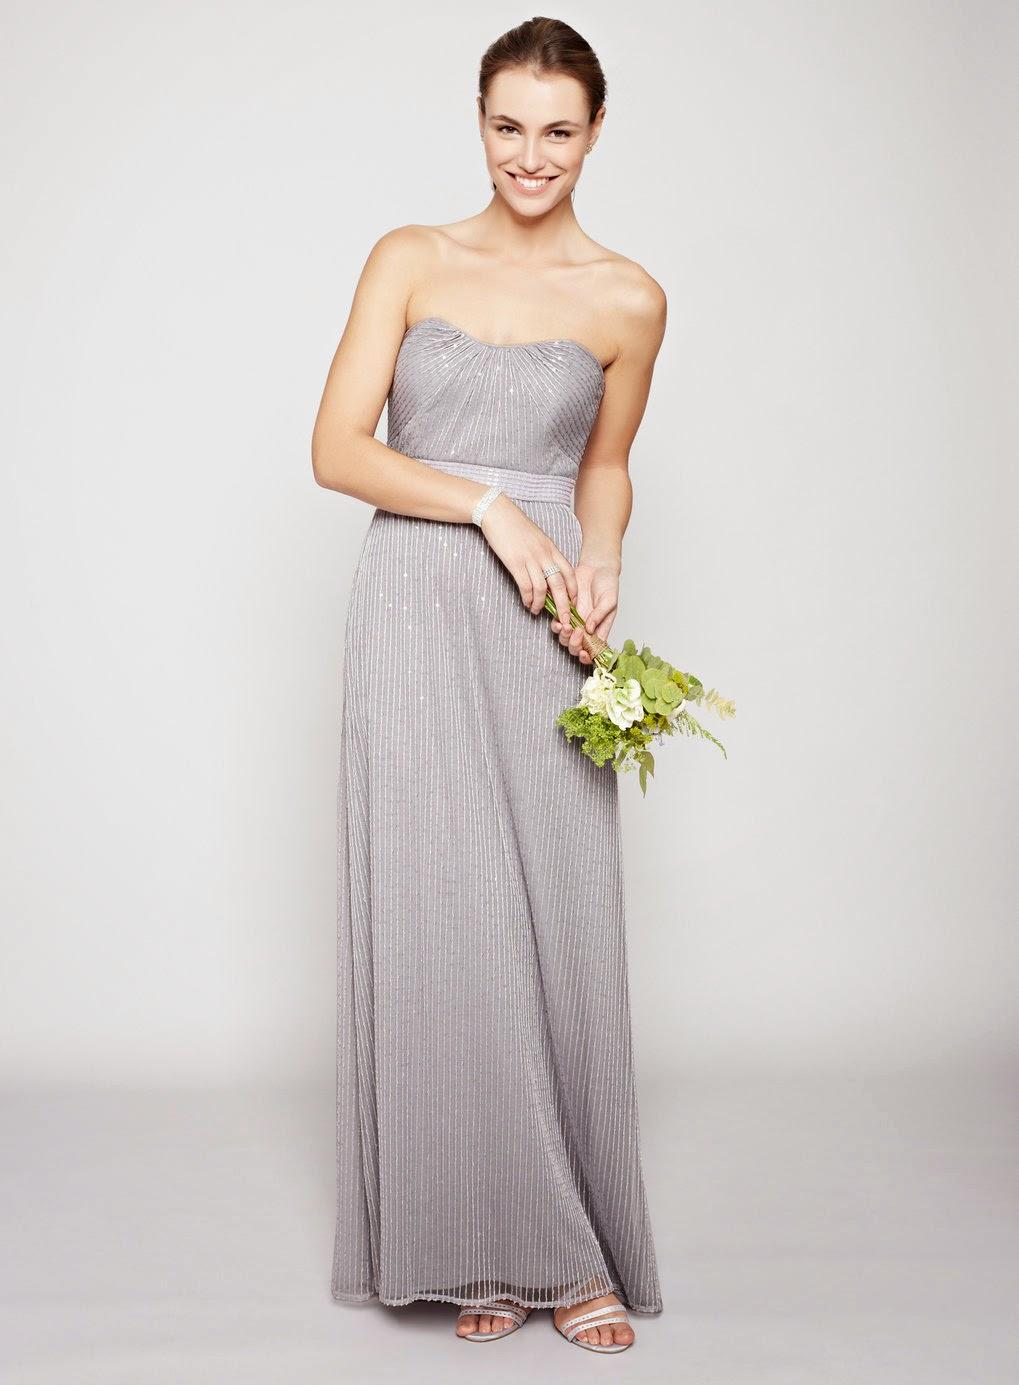 Bhs Outstanding Formal Bridesmaid Dresses Uk